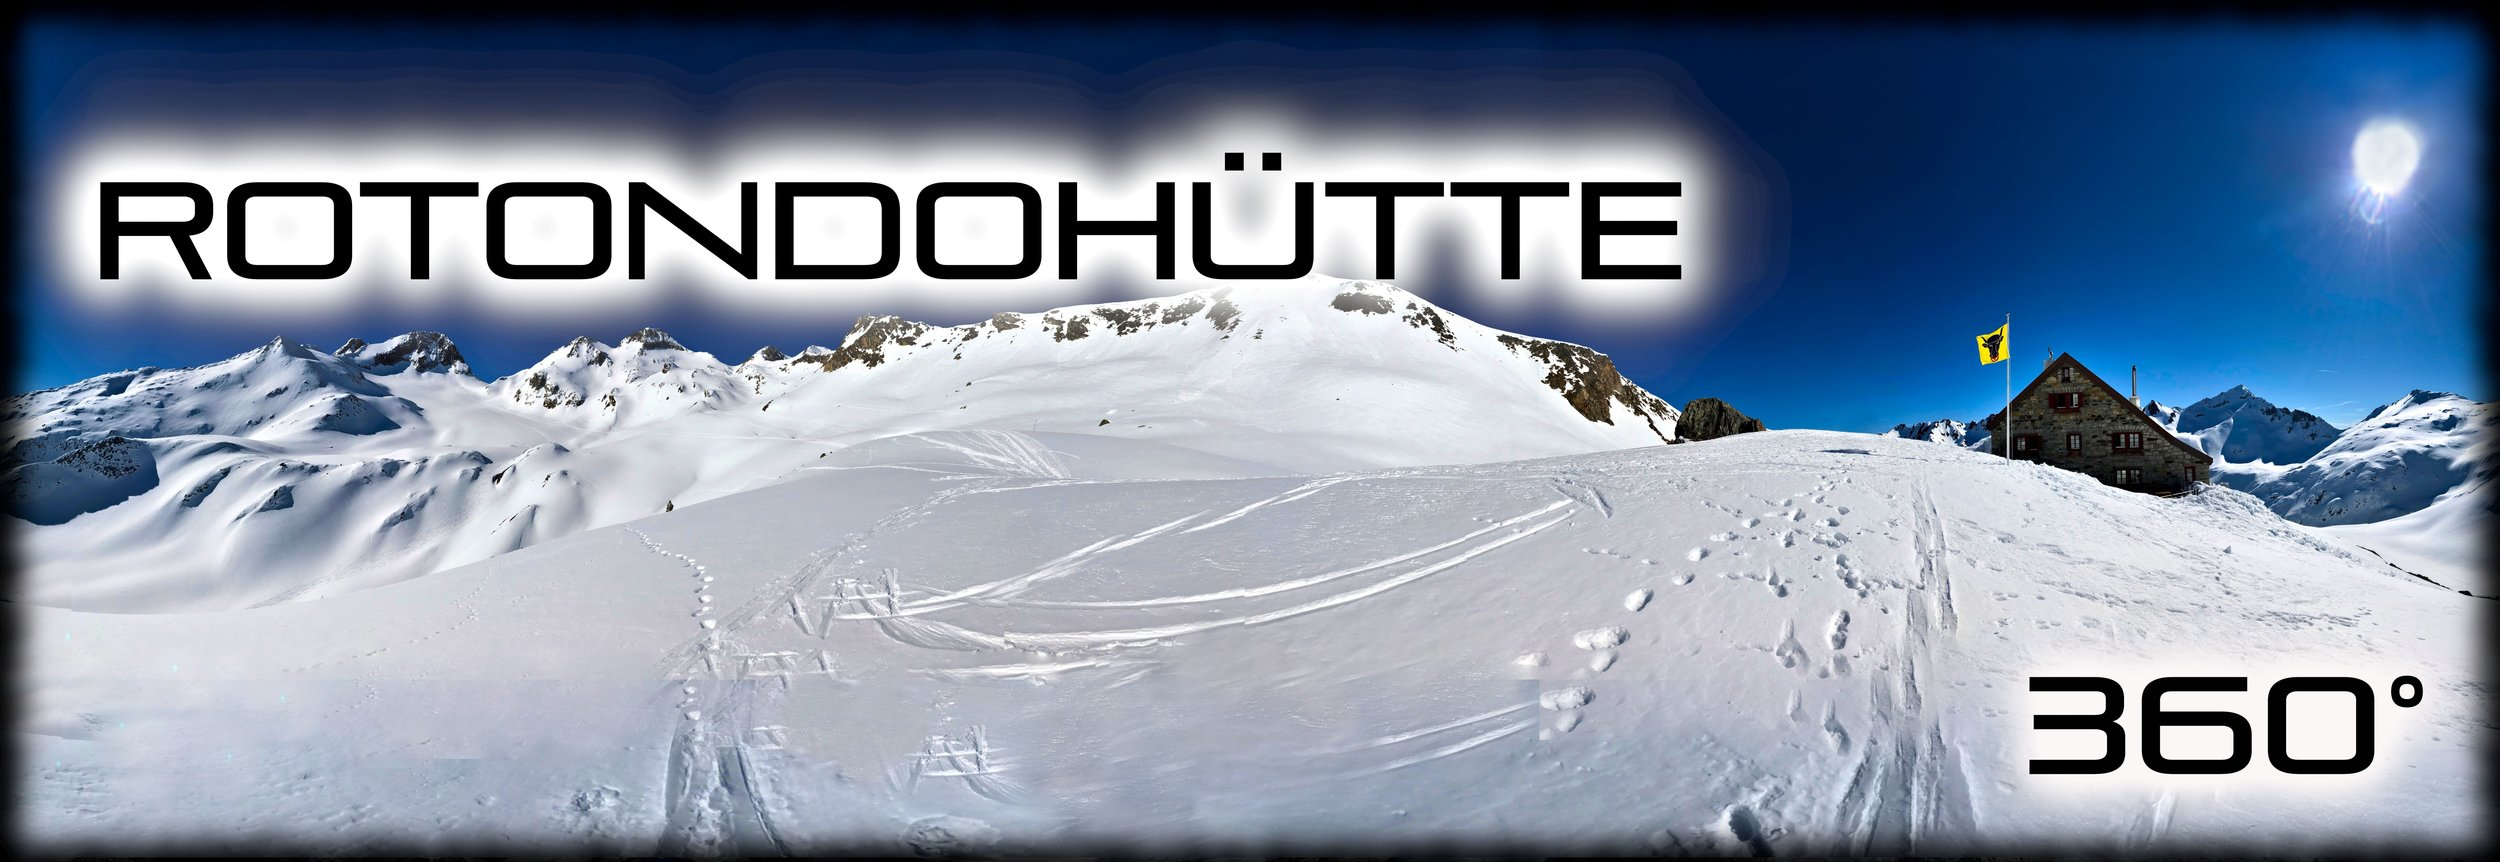 Rotondohütte - 30. März 2019